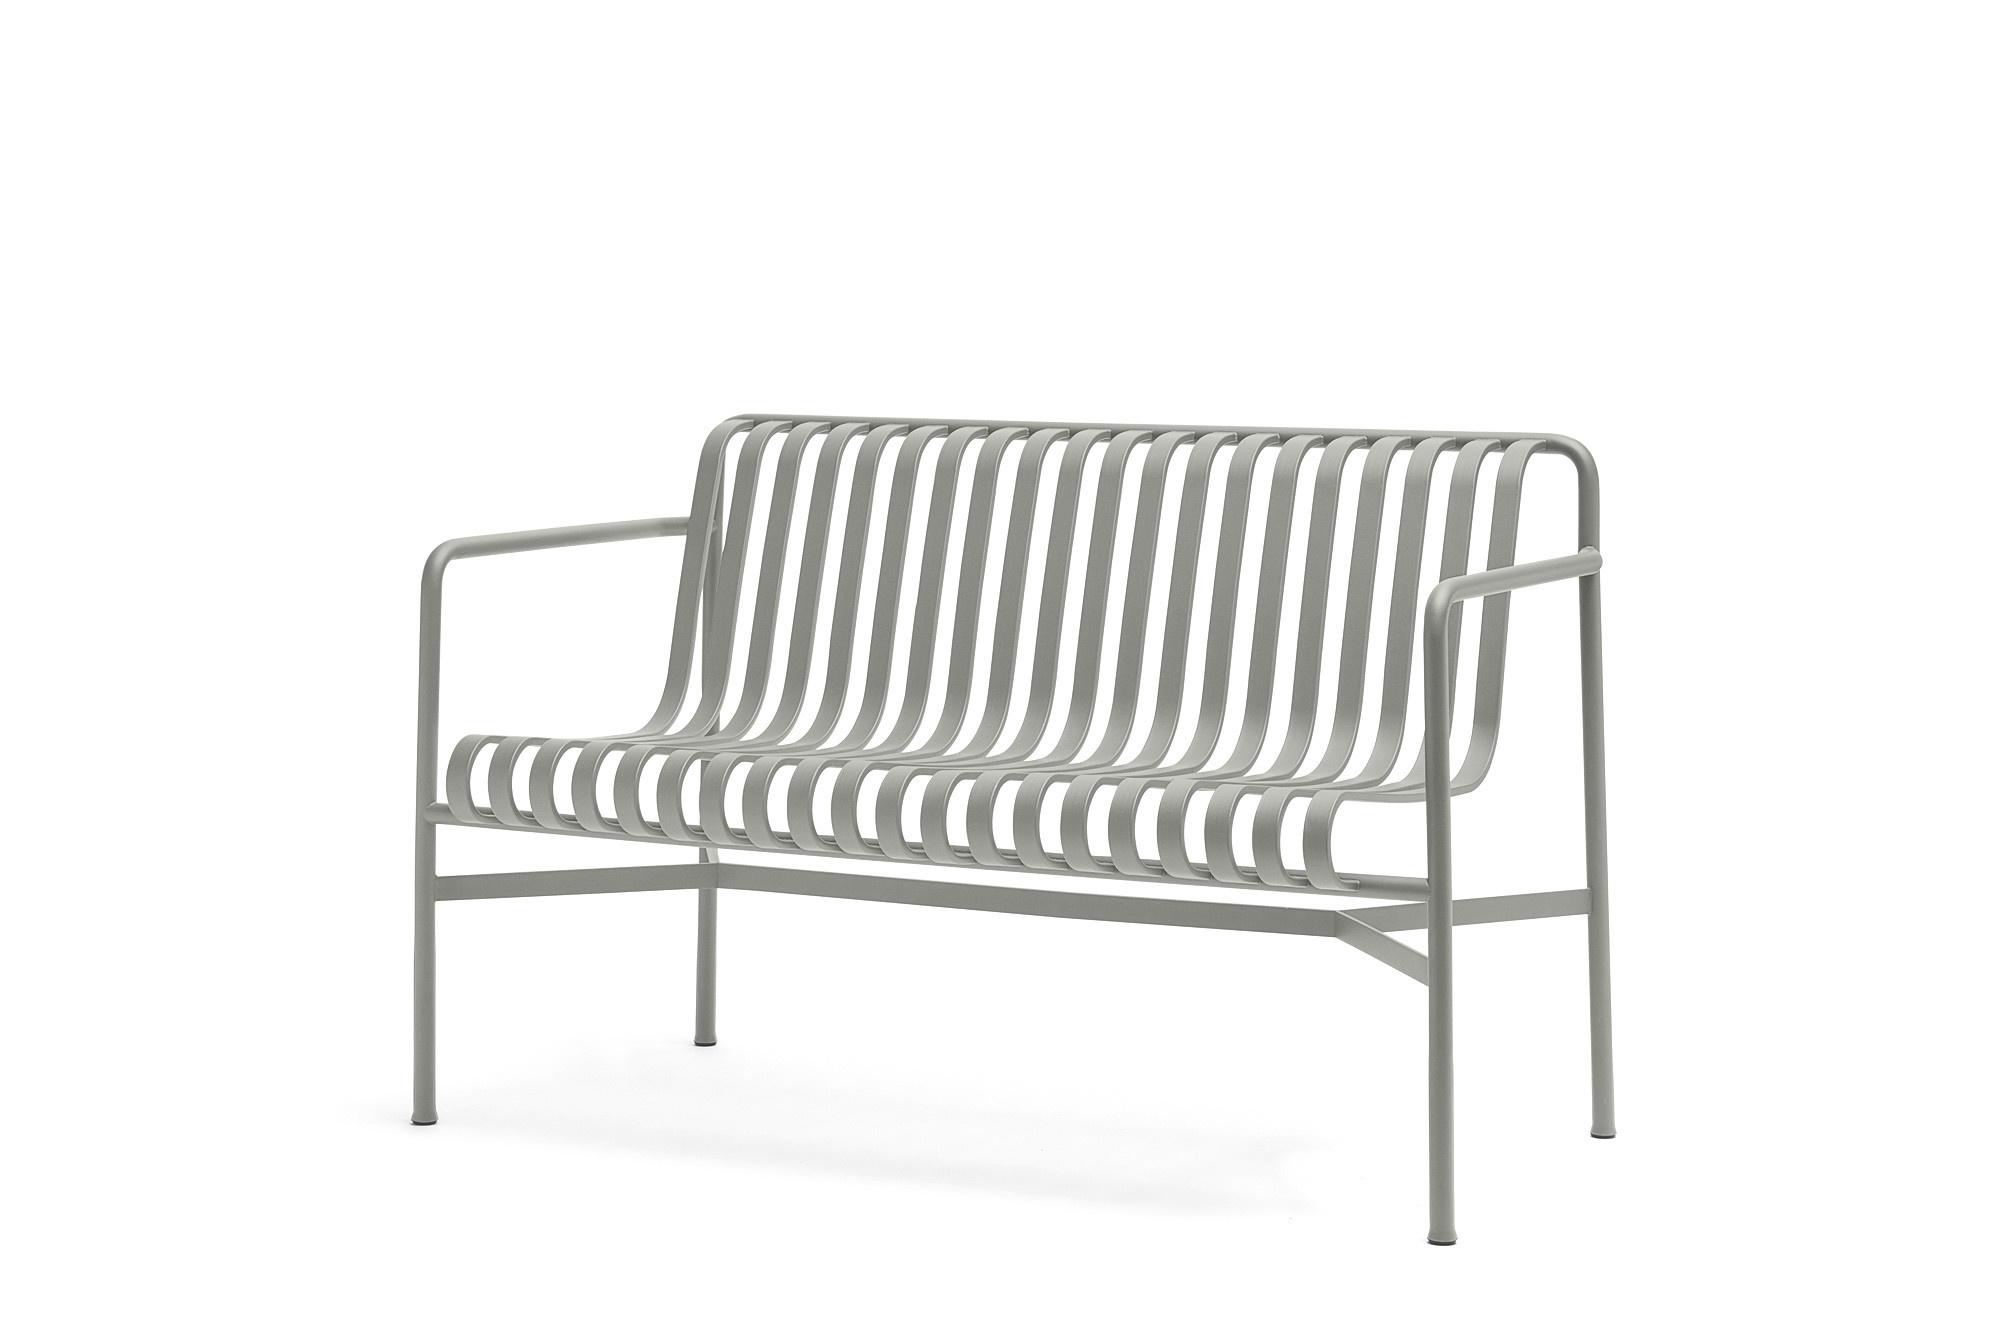 Palissade Dining bench-4